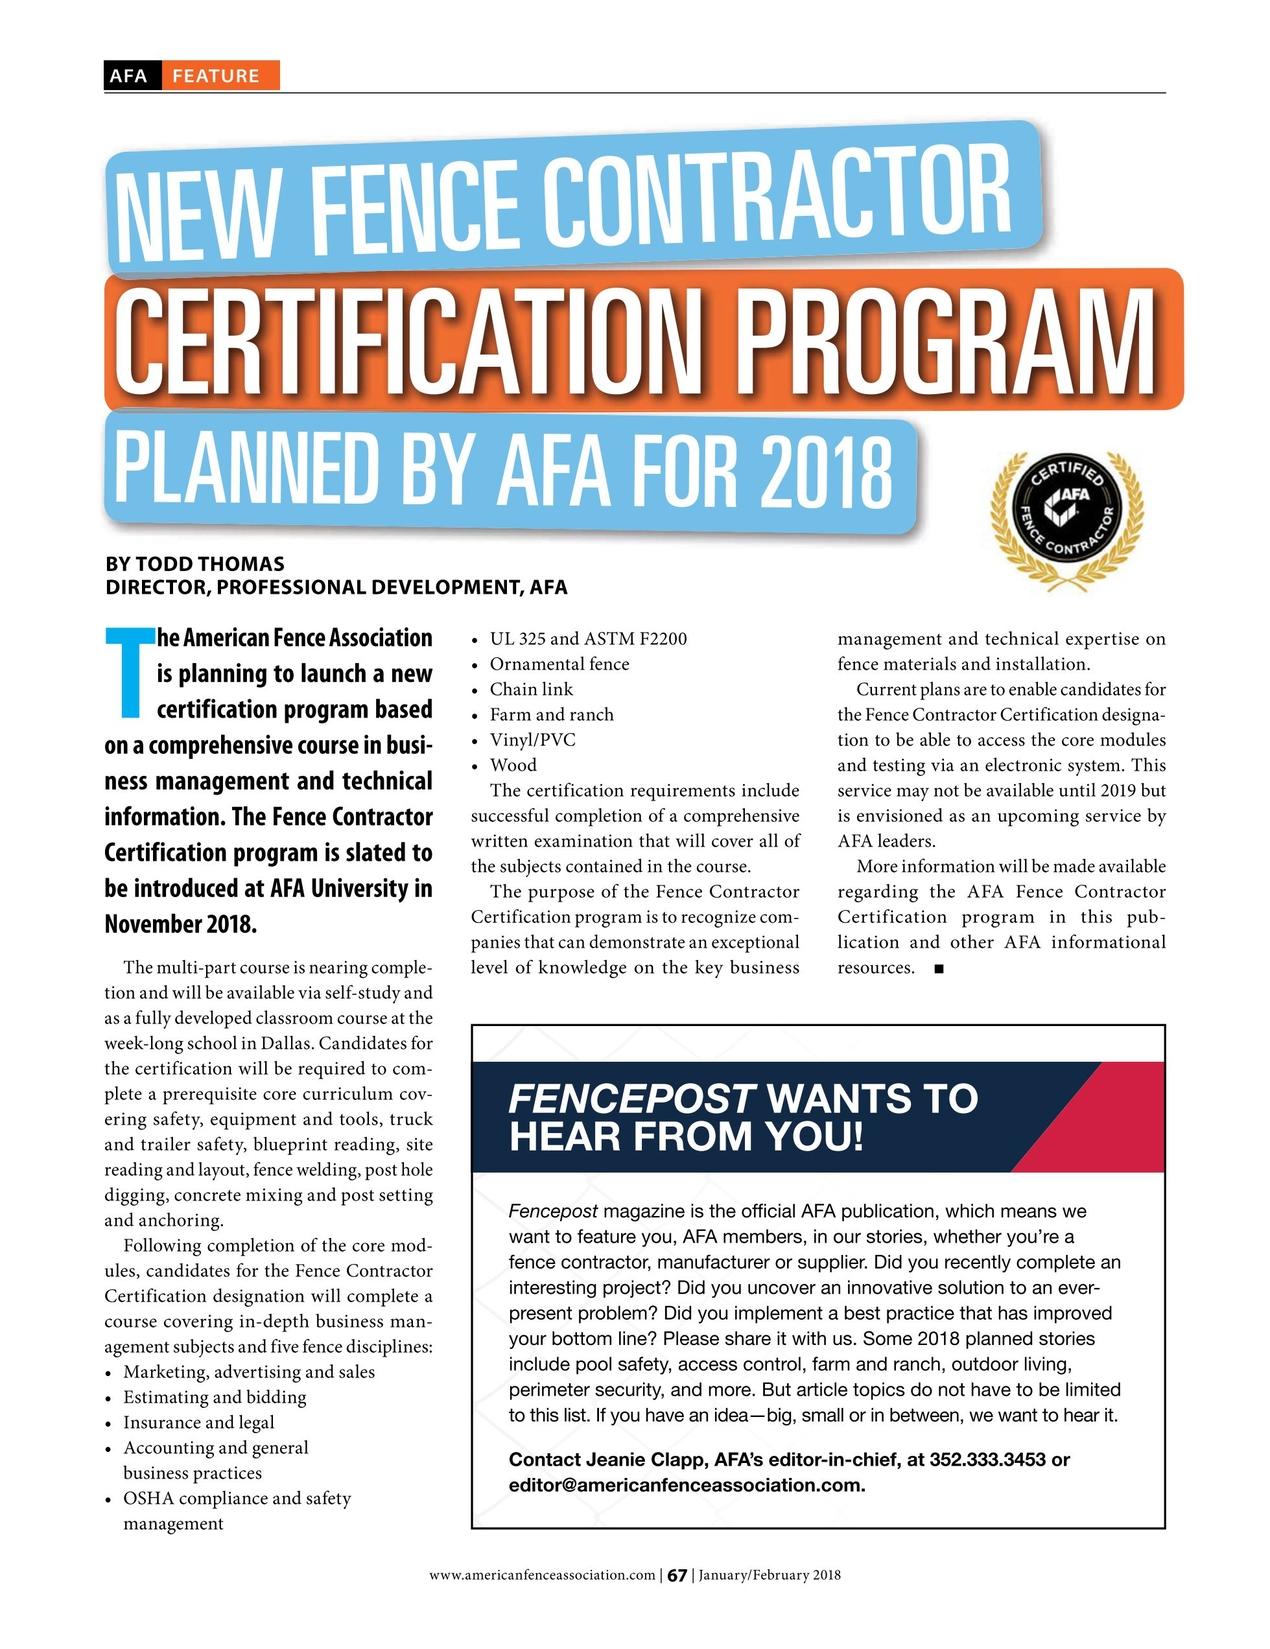 Wunderbar Afa Certification Fotos - zertifizierungsstelle ...